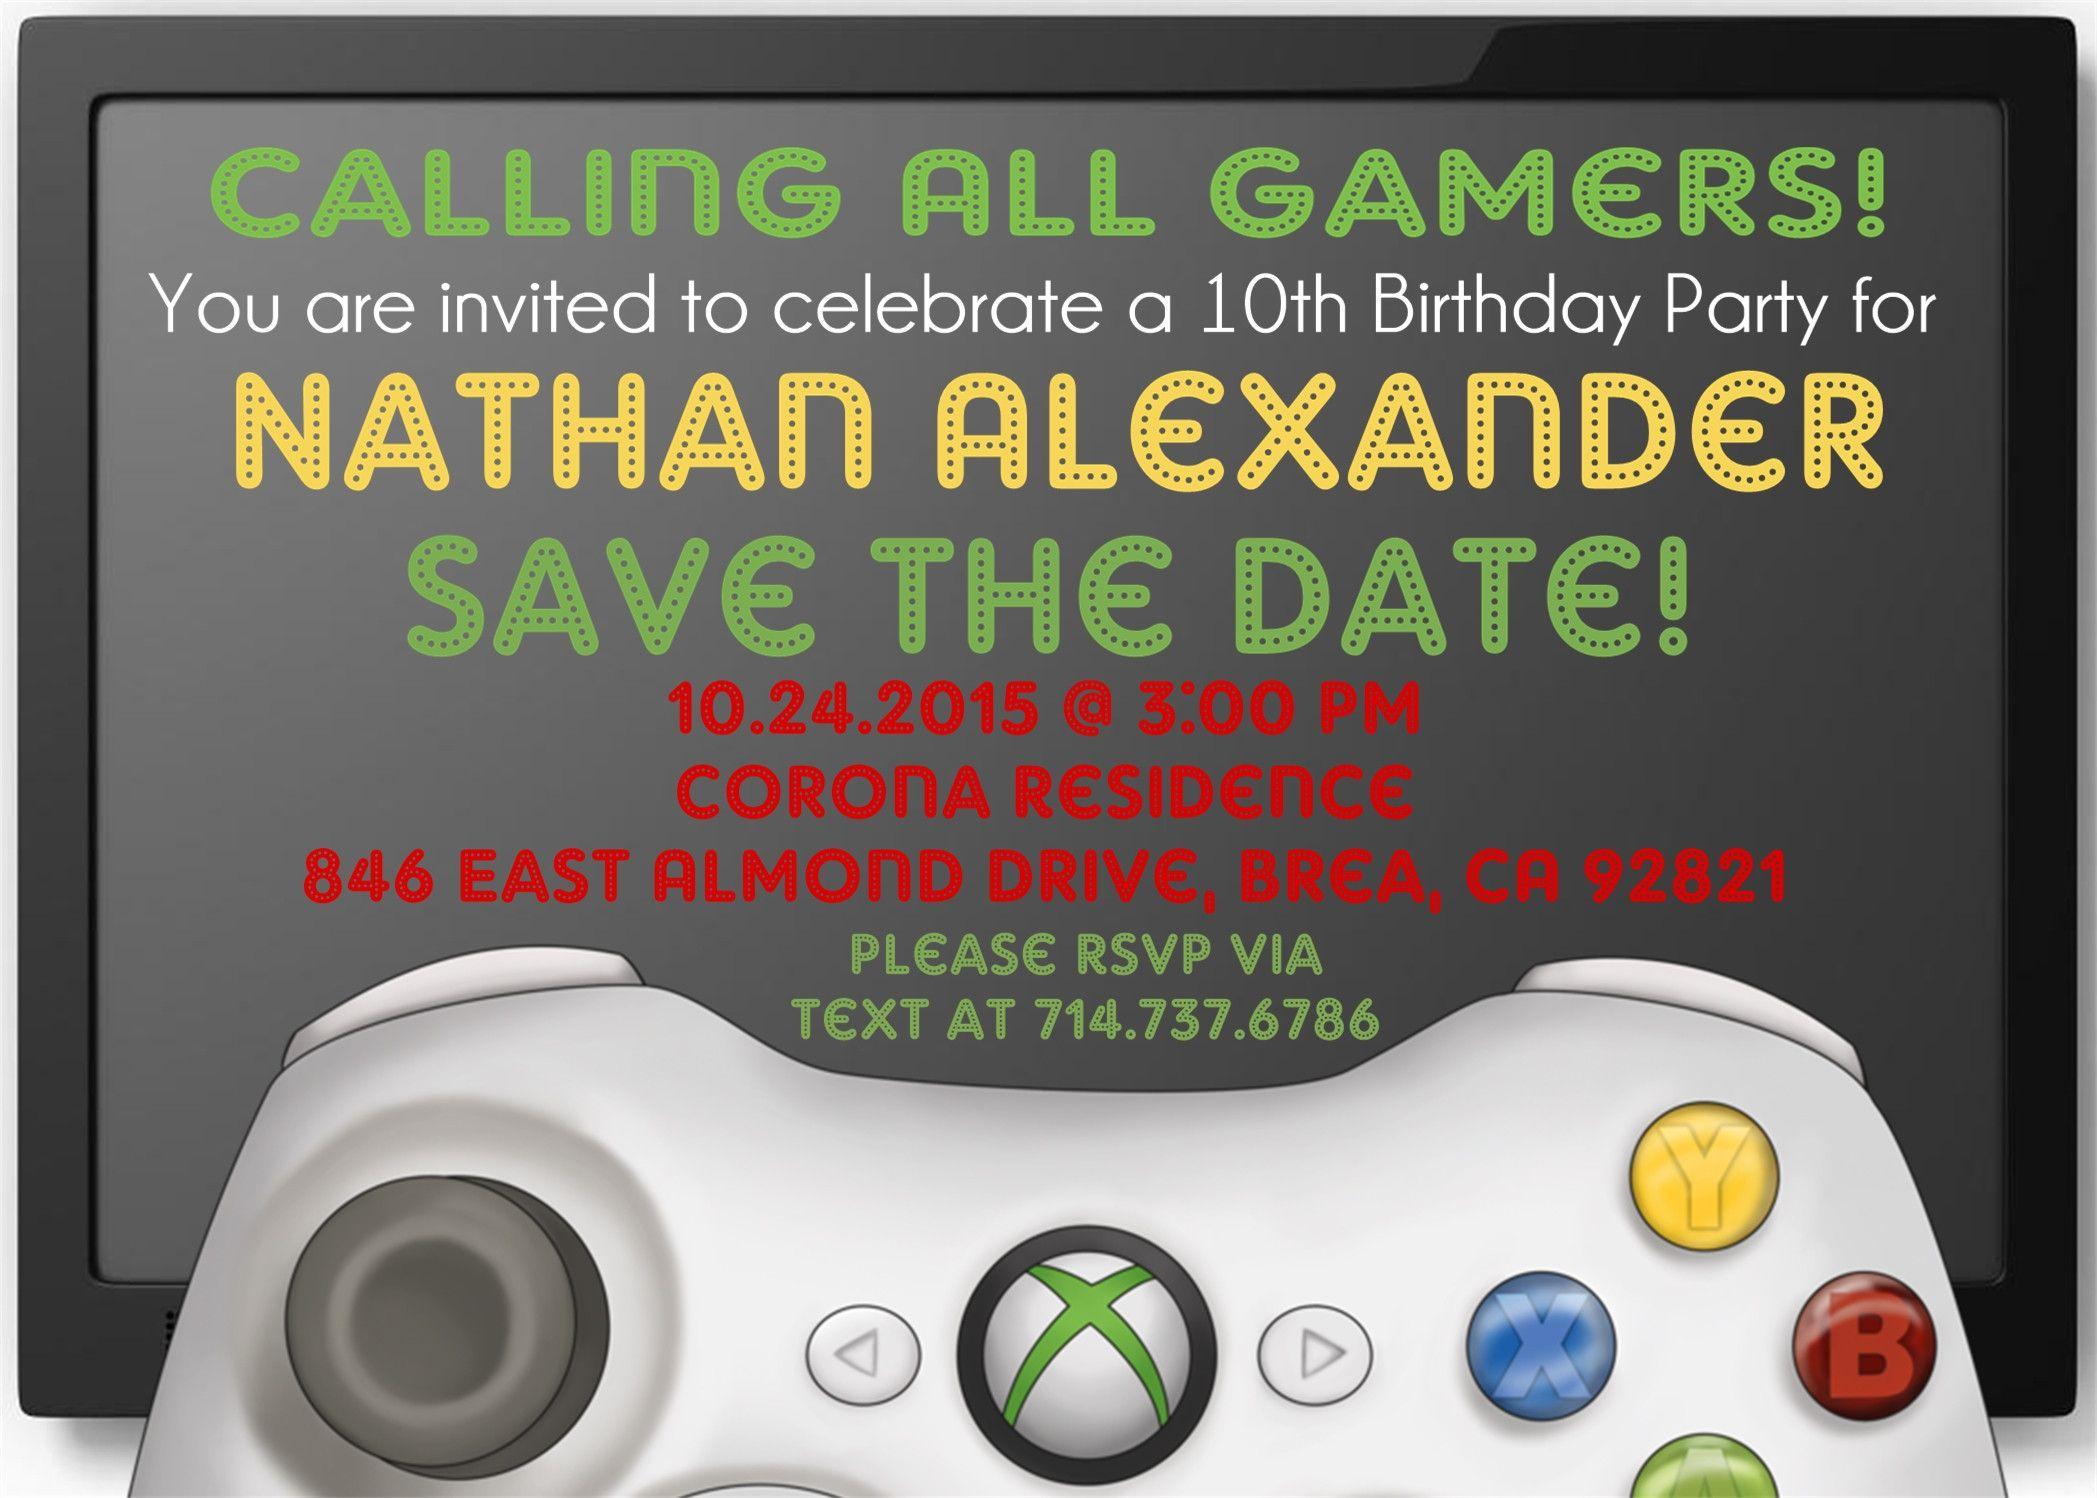 XBOX Birthday Party Invitations in 2018 | XBOX Video Game Birthday ...